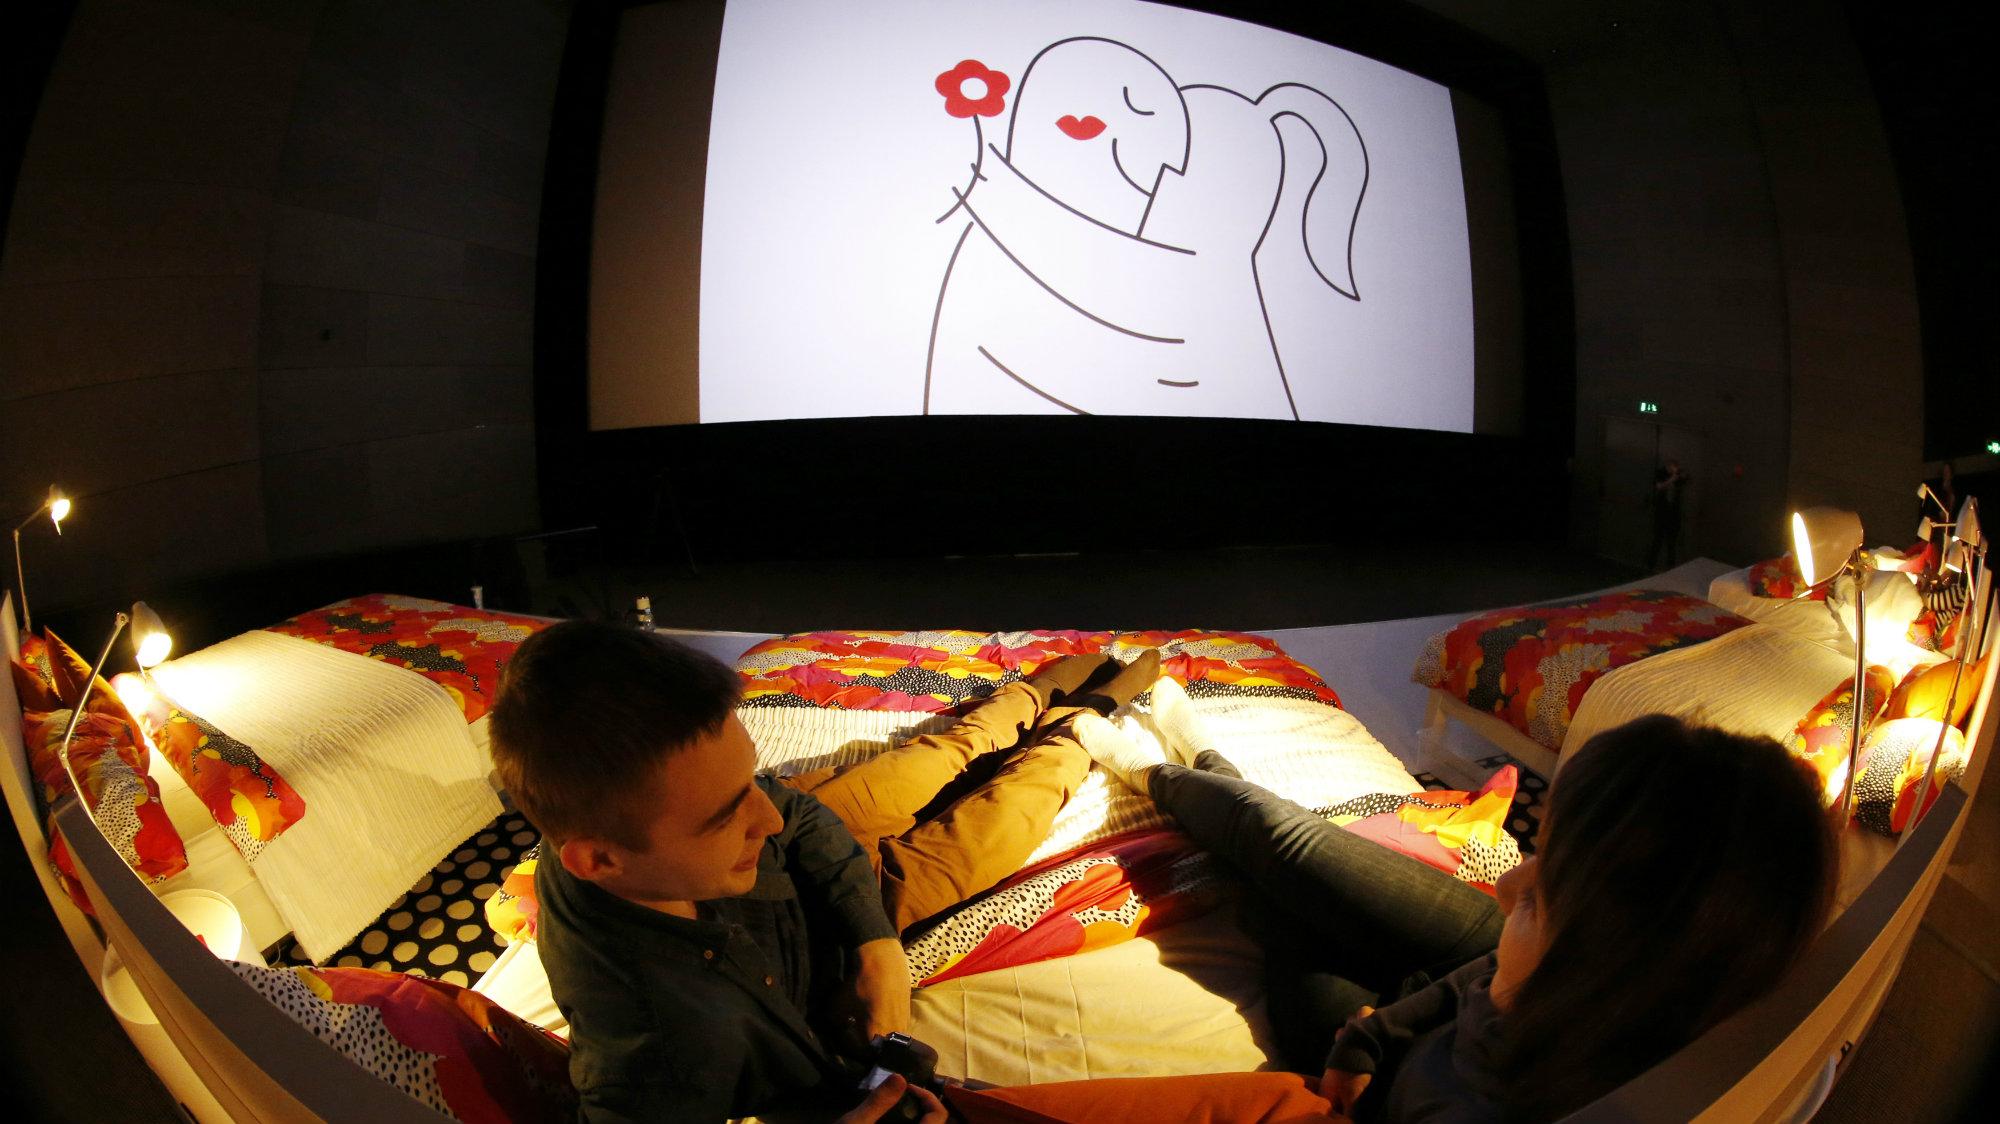 Spectators await the start of an Ikea-sponsored cinema screening at a Kinostar De Lux Multiplex in a Moscow suburb.